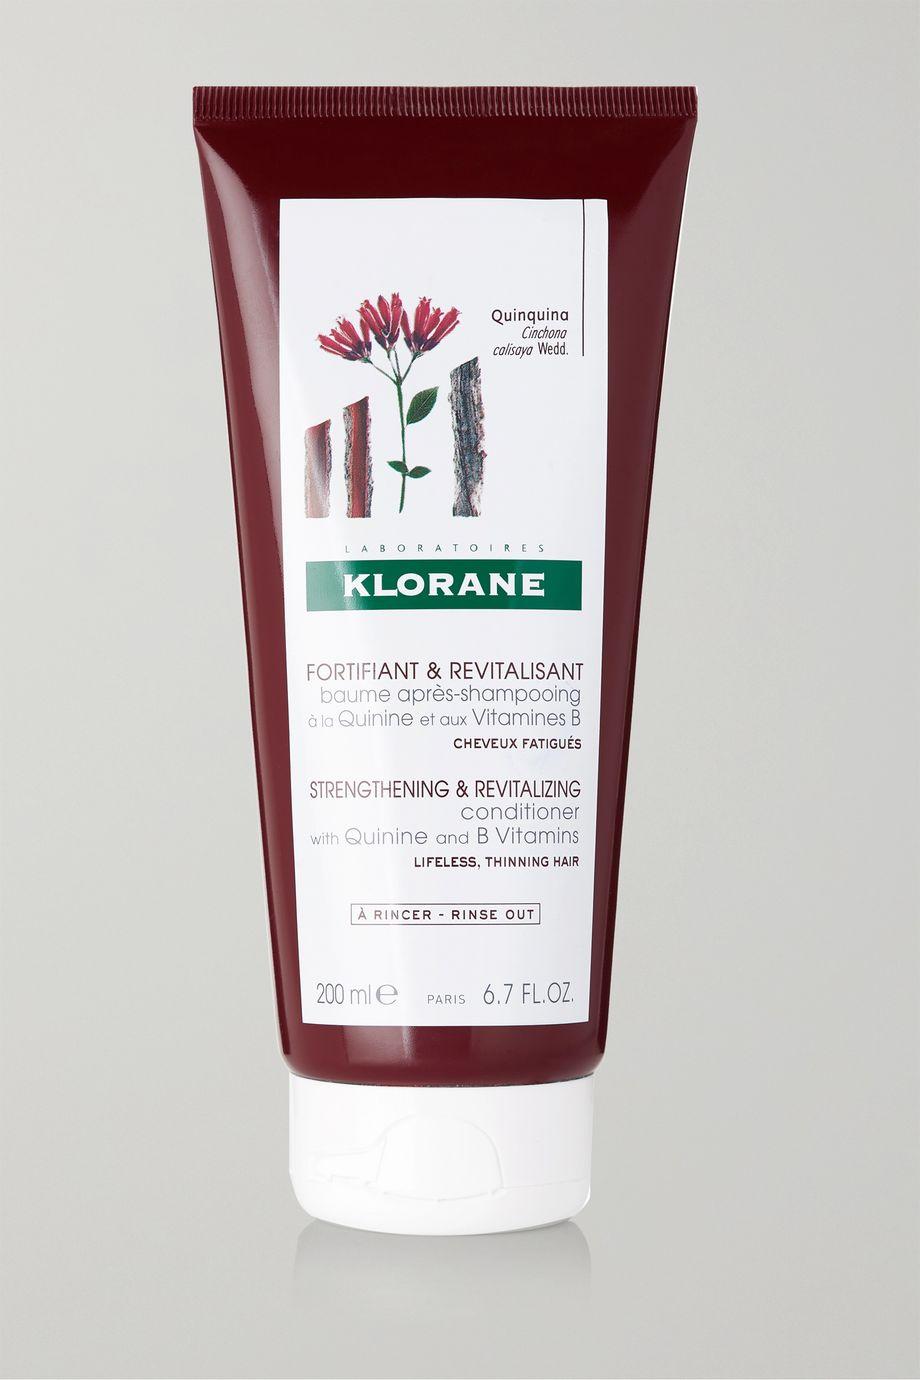 Klorane Strengthening & Revitalizing Conditioner, 200ml